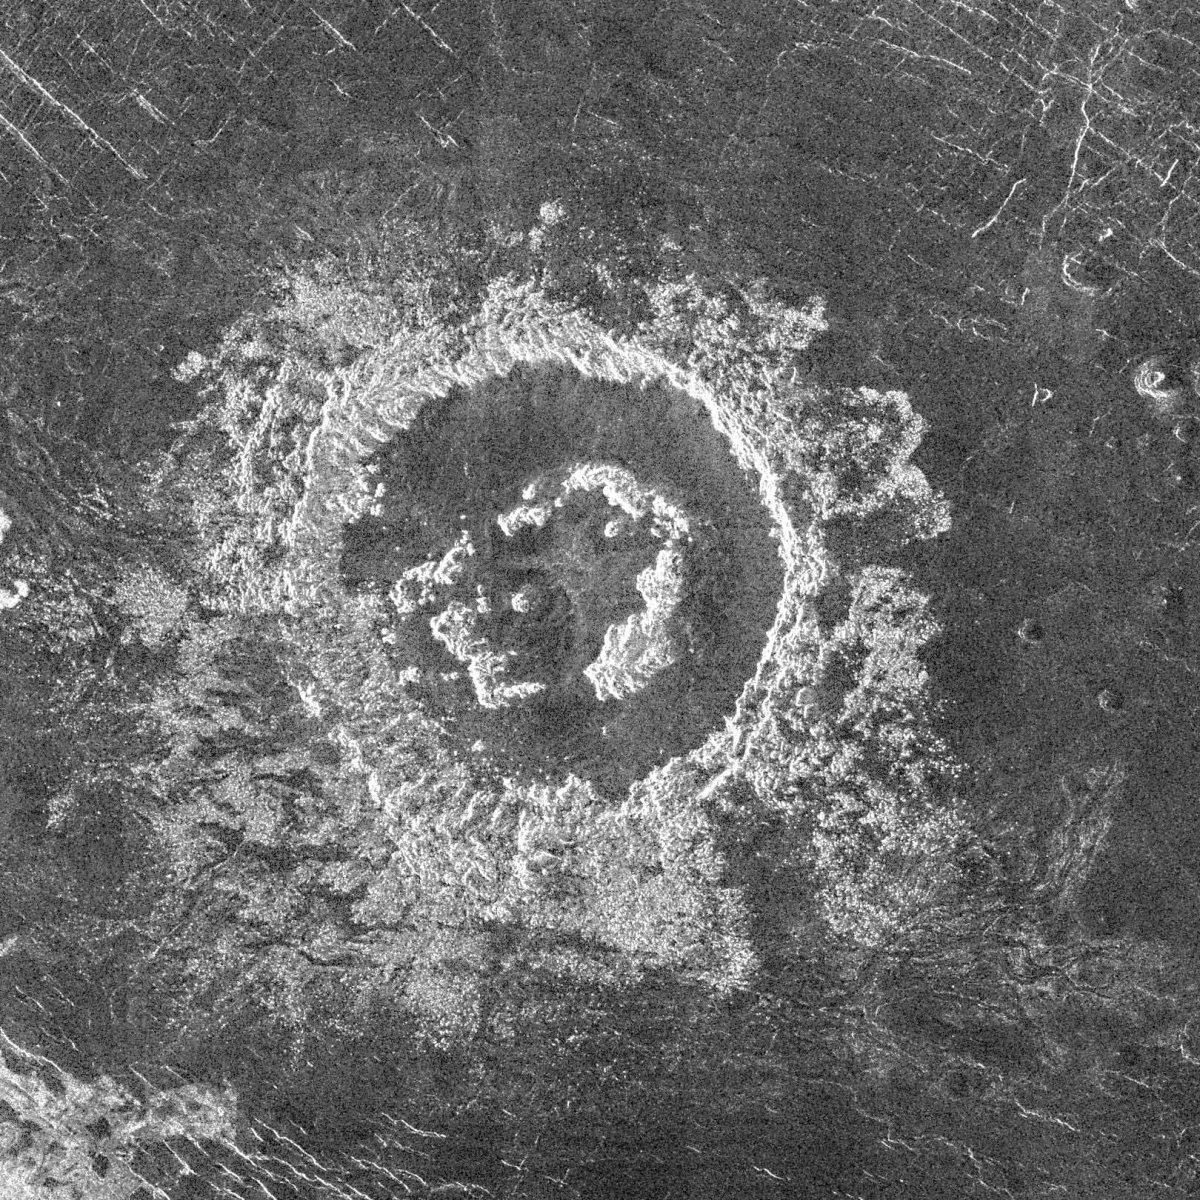 The Barton Crater on Venus